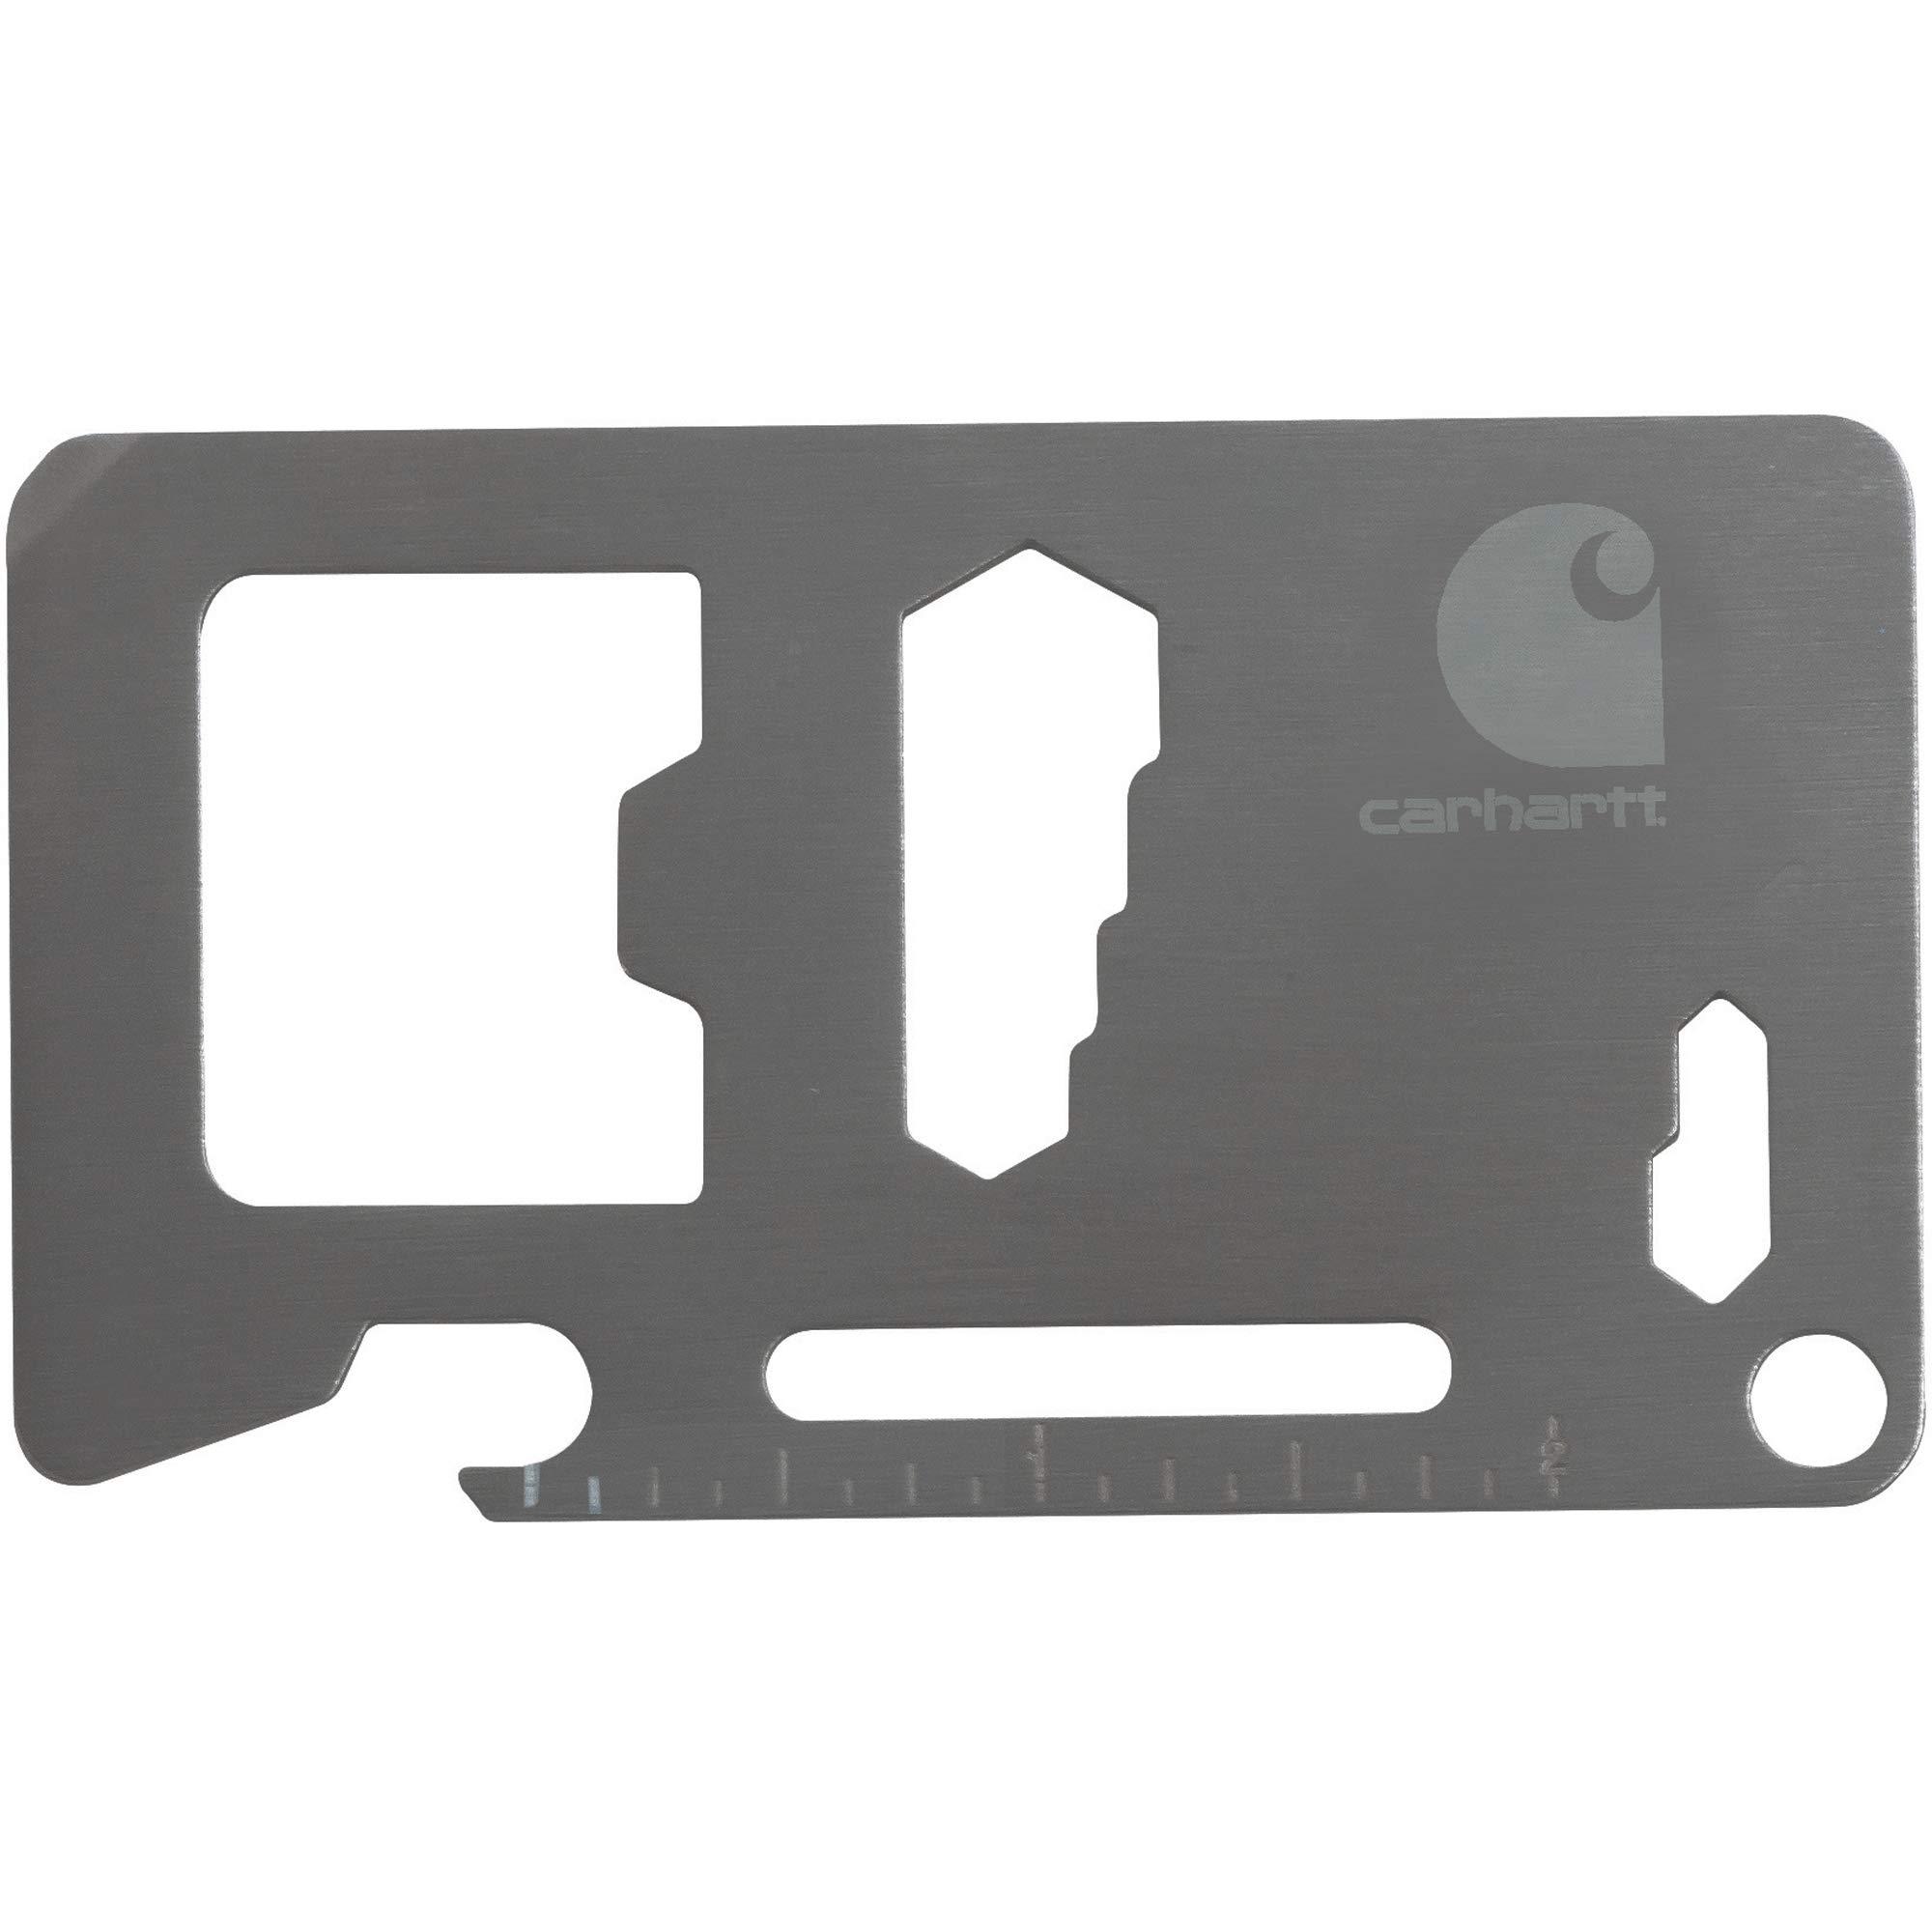 Carhartt 10-in-1 Multi-Tool Wallet Card